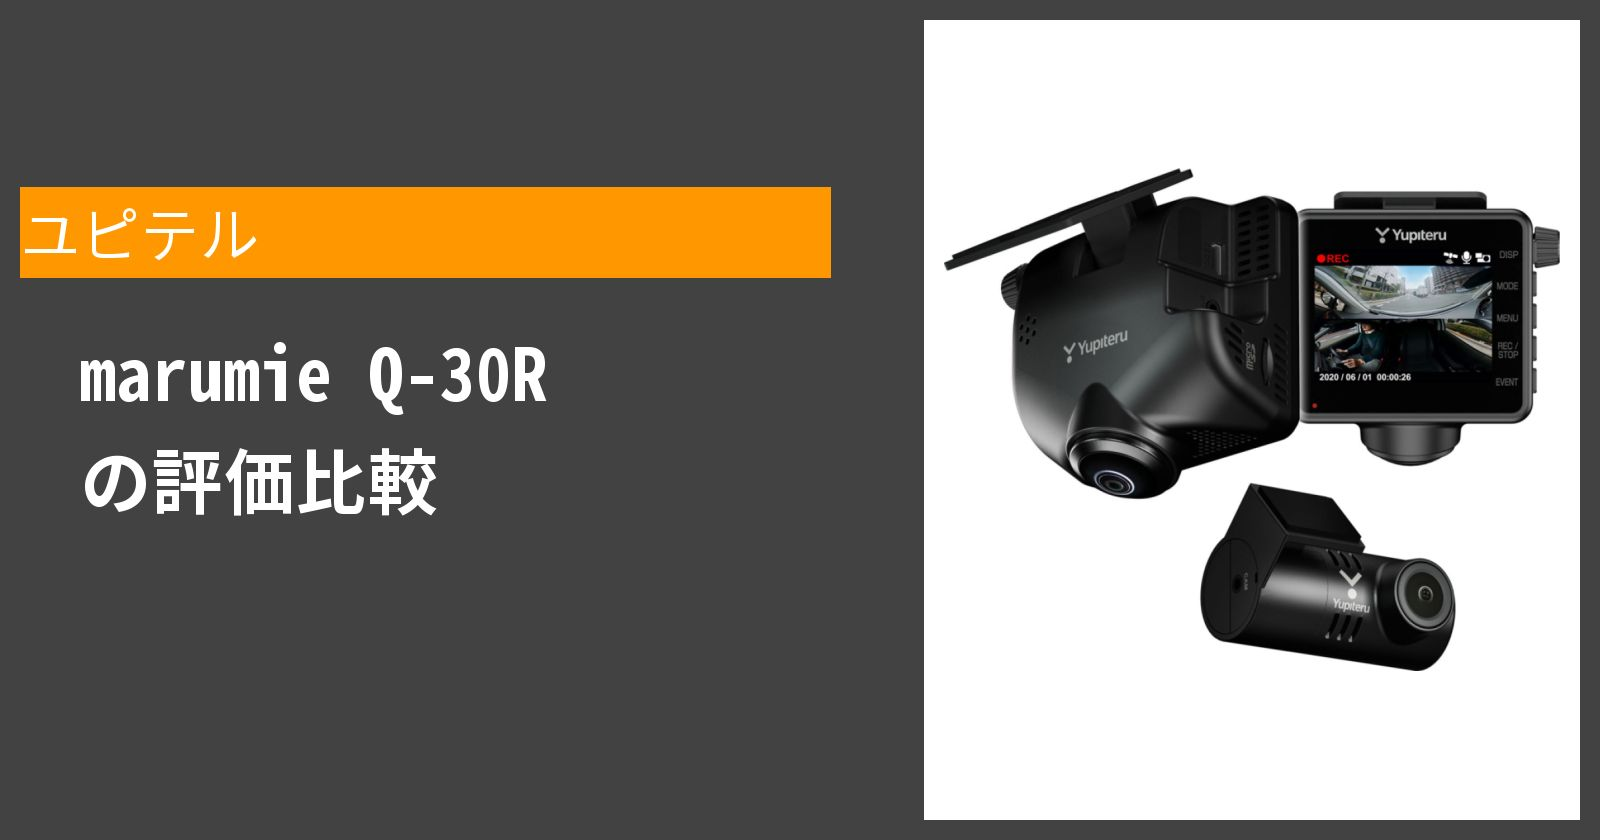 marumie Q-30Rを徹底評価